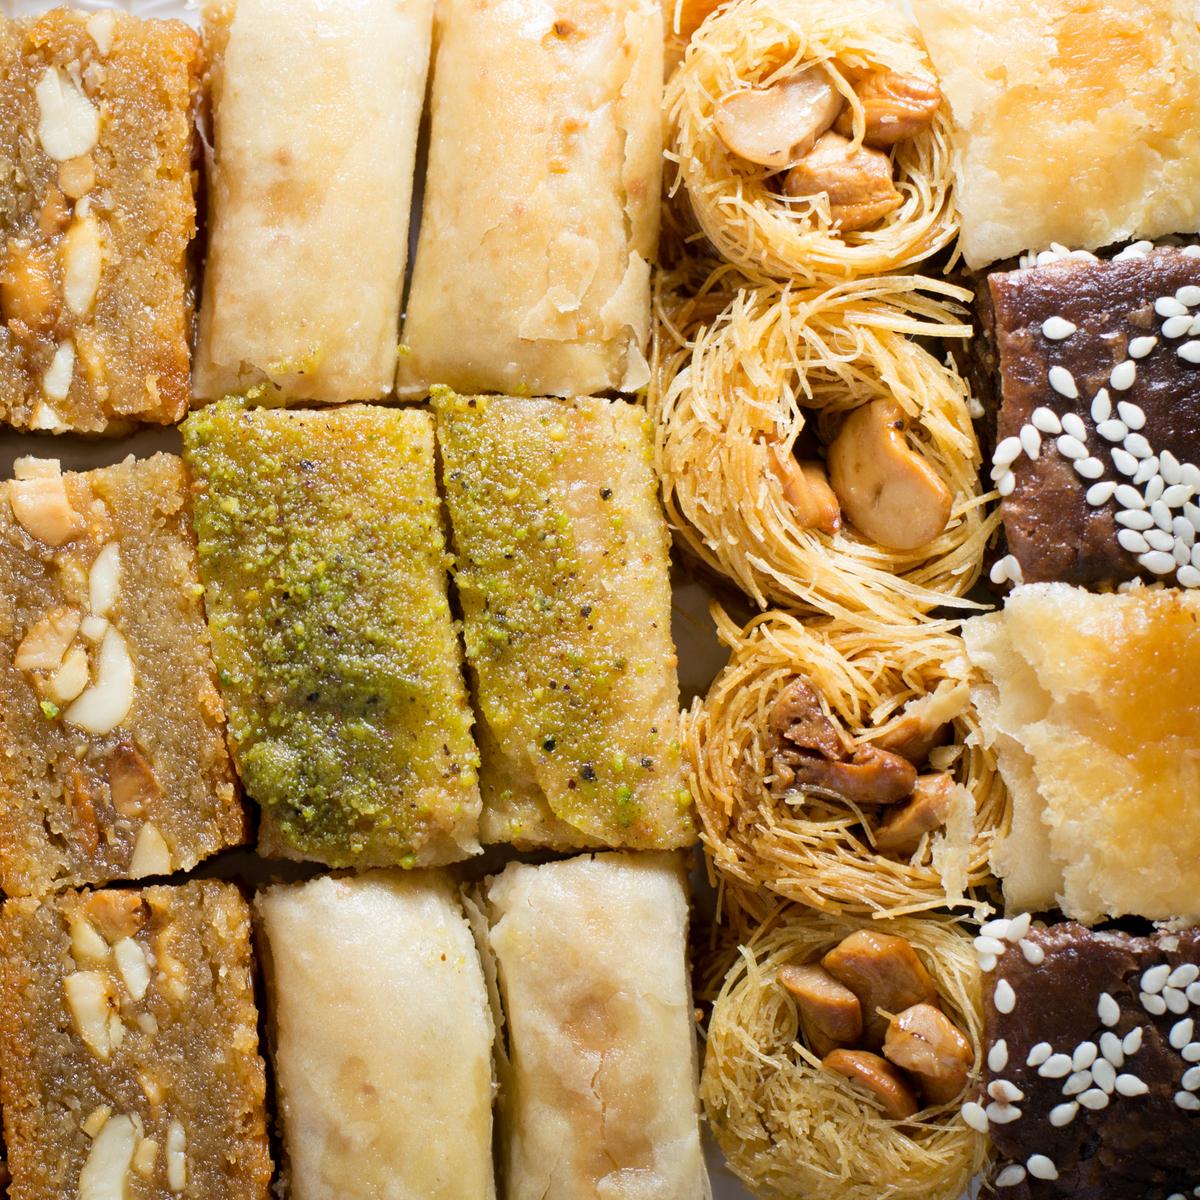 "Ассорти Пахлава - ассорти ливанских сладостей ""Оронт"", 600 г import_files_6f_6f5dd39b787e11e799f3606c664b1de1_2456a41c2e9411e8a993484d7ecee297.jpg"